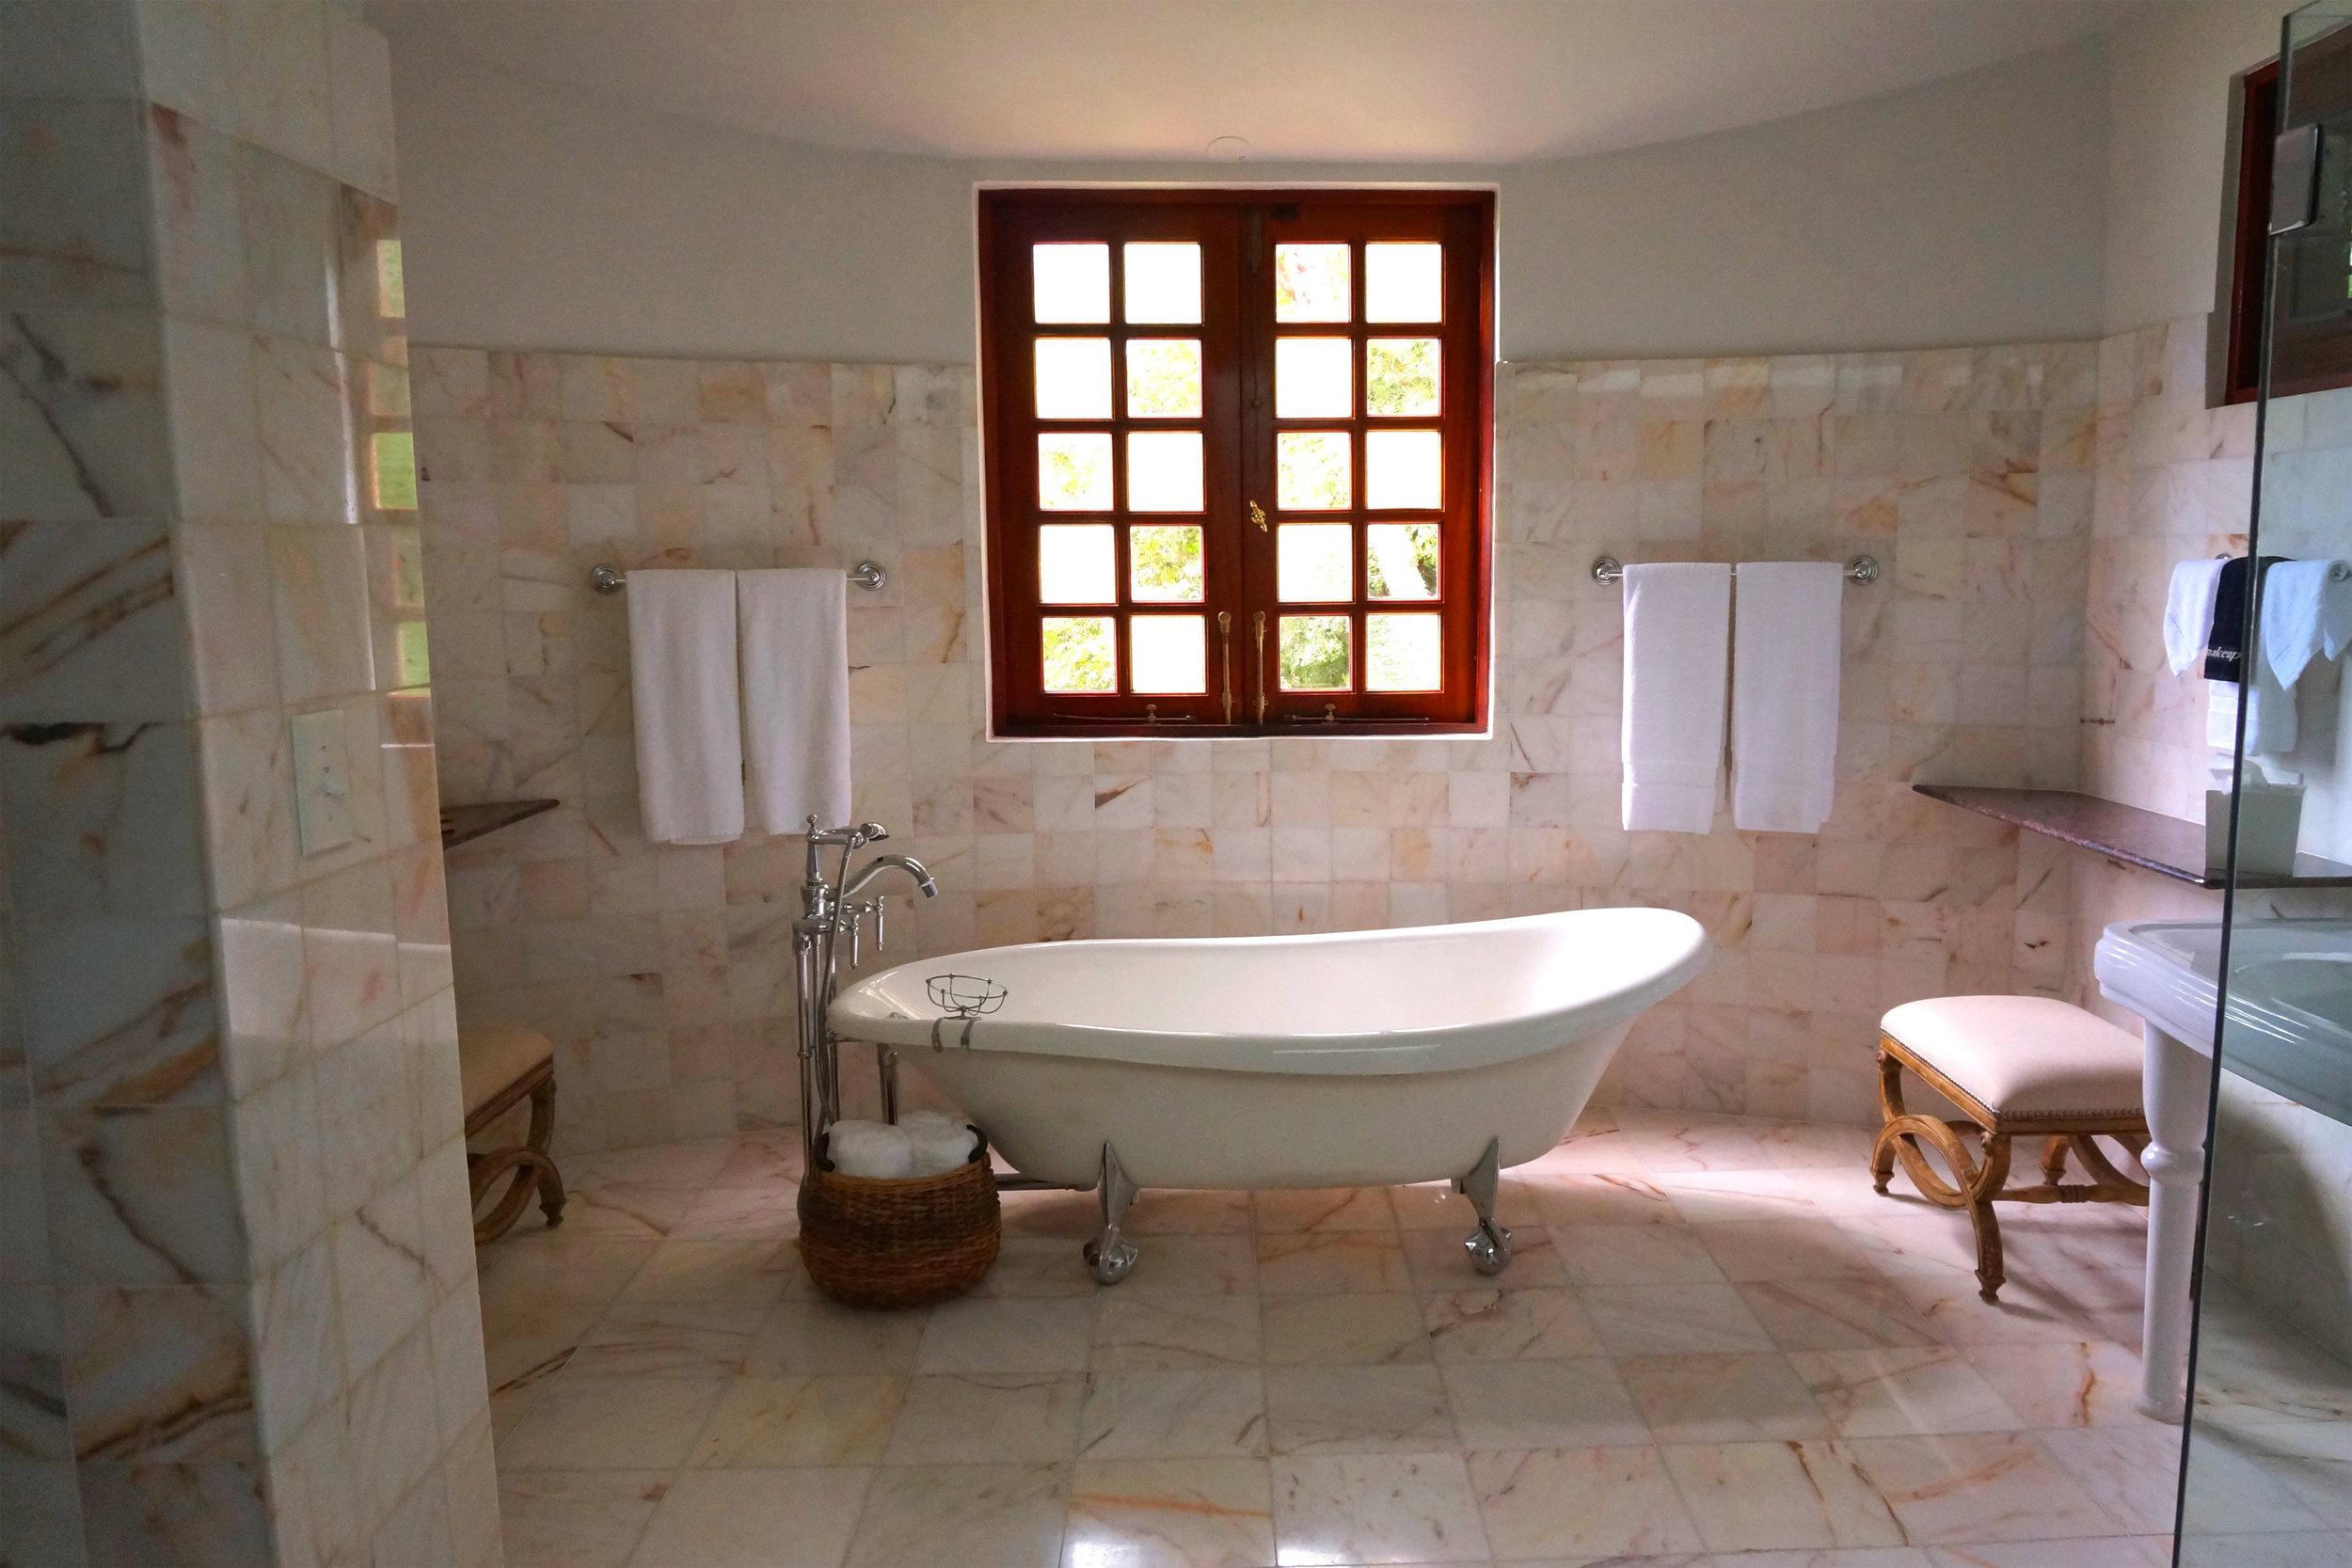 kitchen & bath corner cabinets for carina bathroom clean faucet 145512 jpg